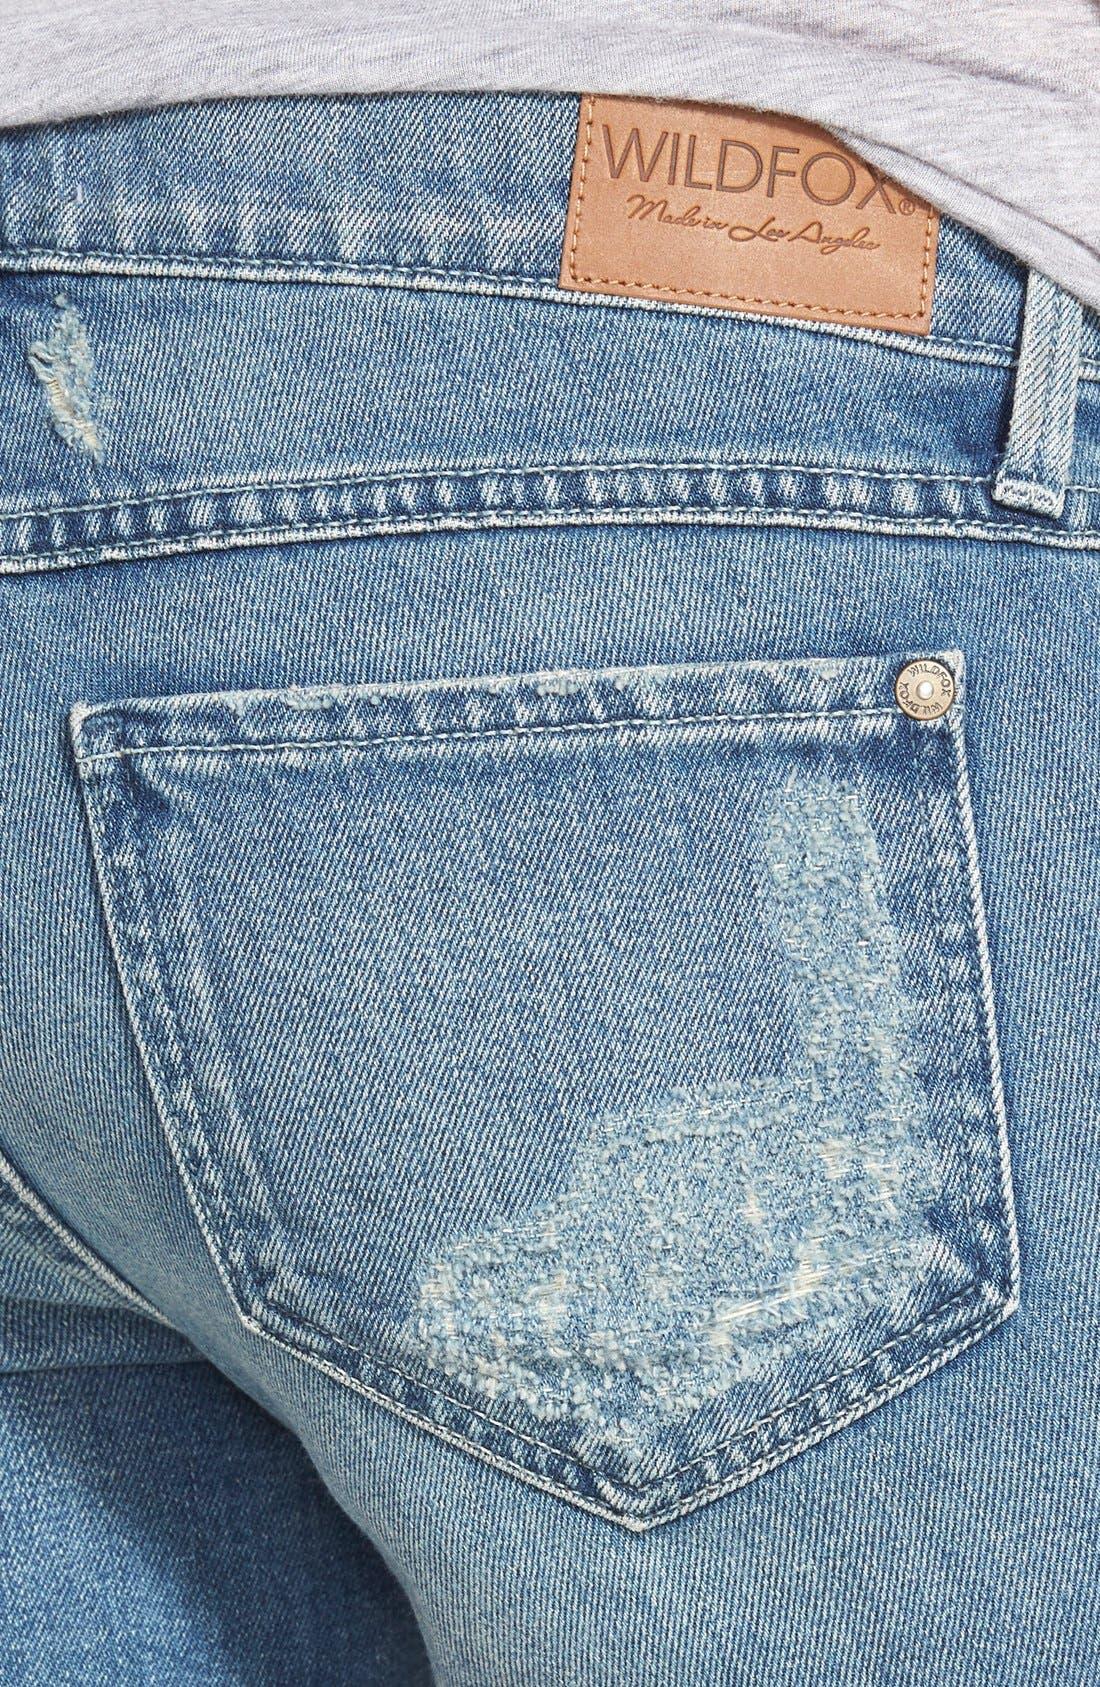 'Sawyer' Cutoff Denim Shorts,                             Alternate thumbnail 2, color,                             400